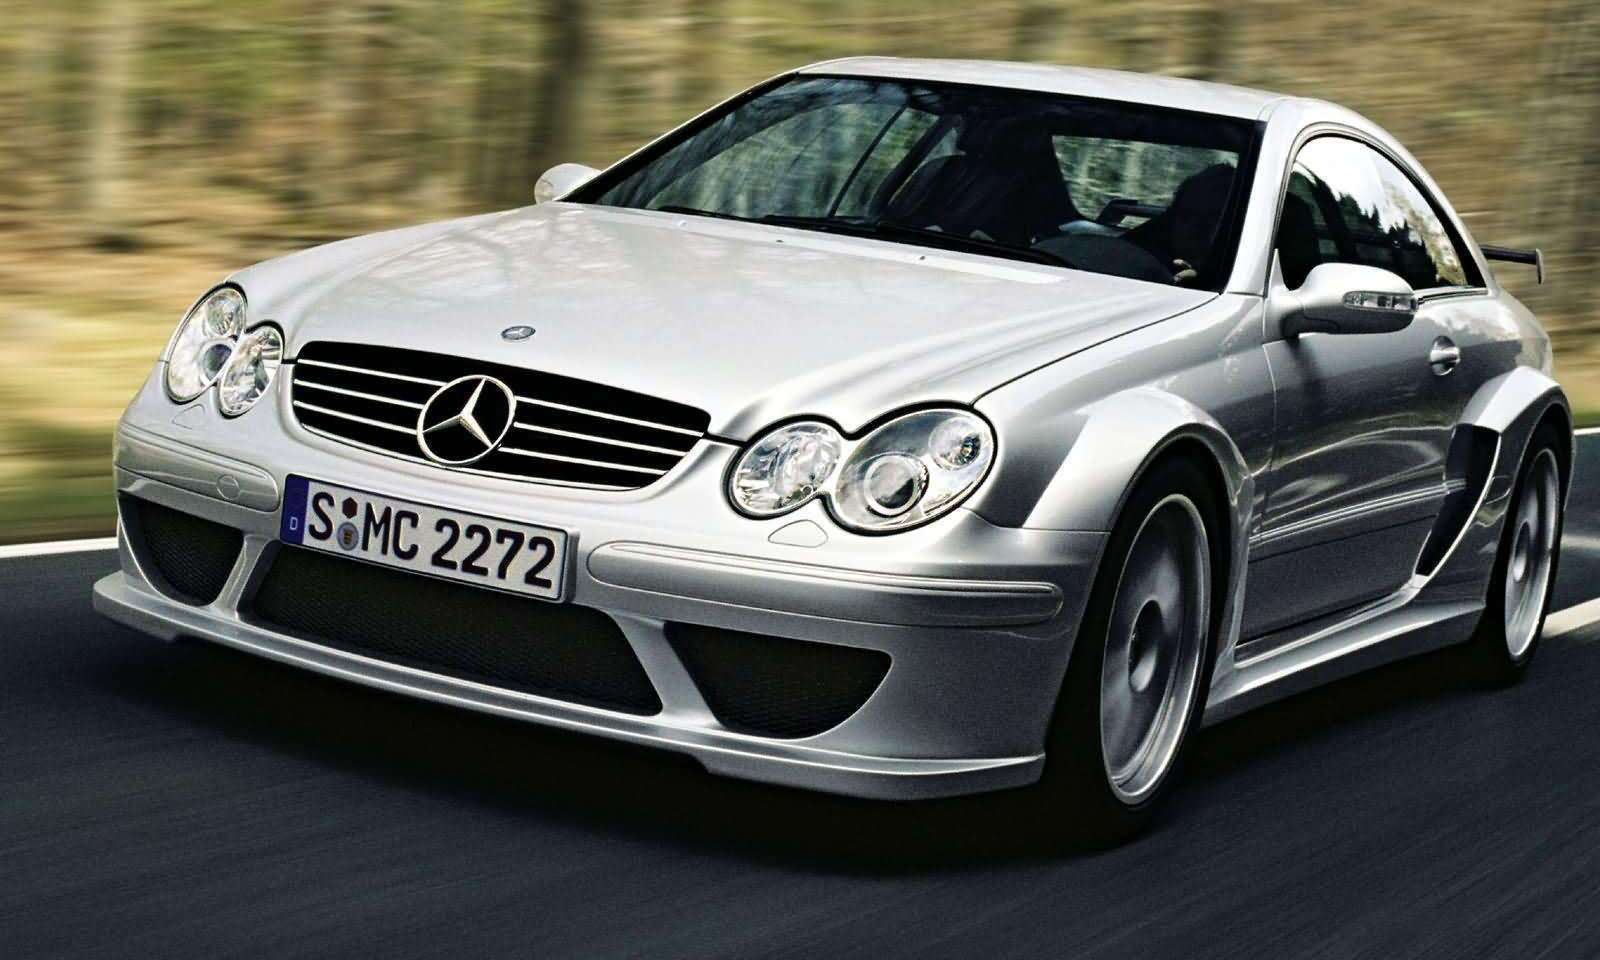 Mercedes Benz Clk Dtm Amg 2004 1600 02